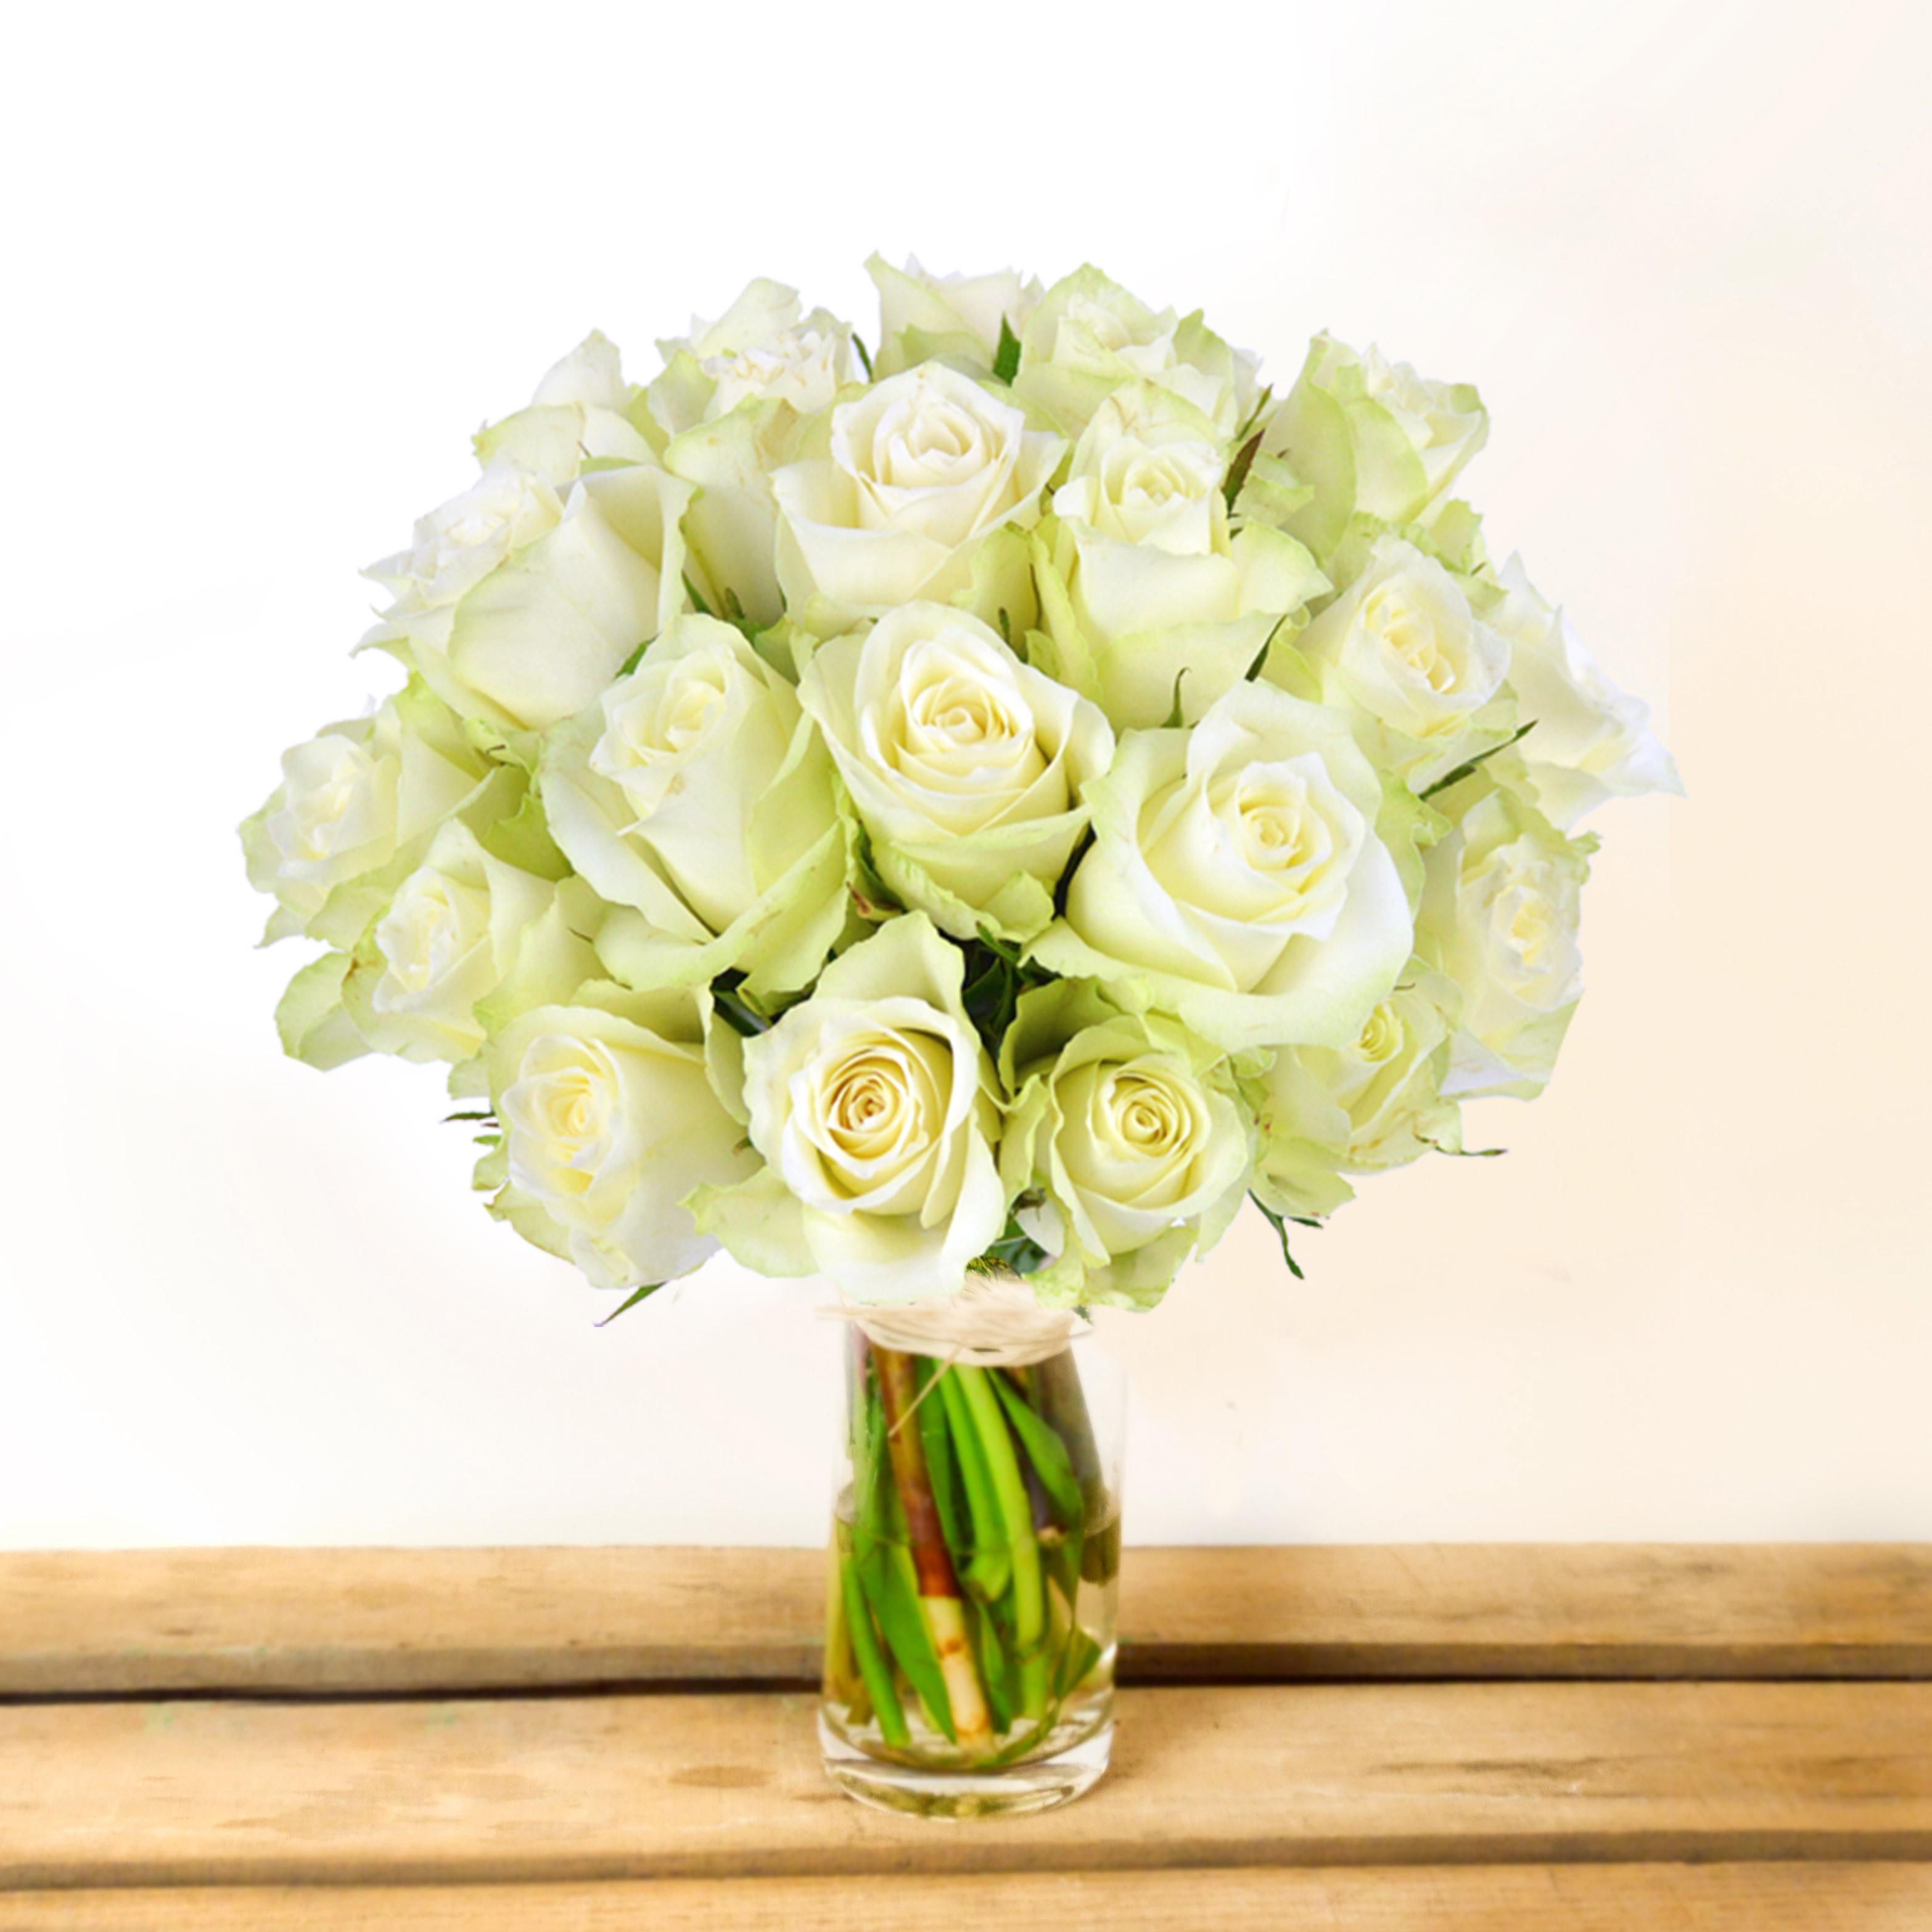 Relativ Bouquet de Roses blanches - plantationmacintosh SL71